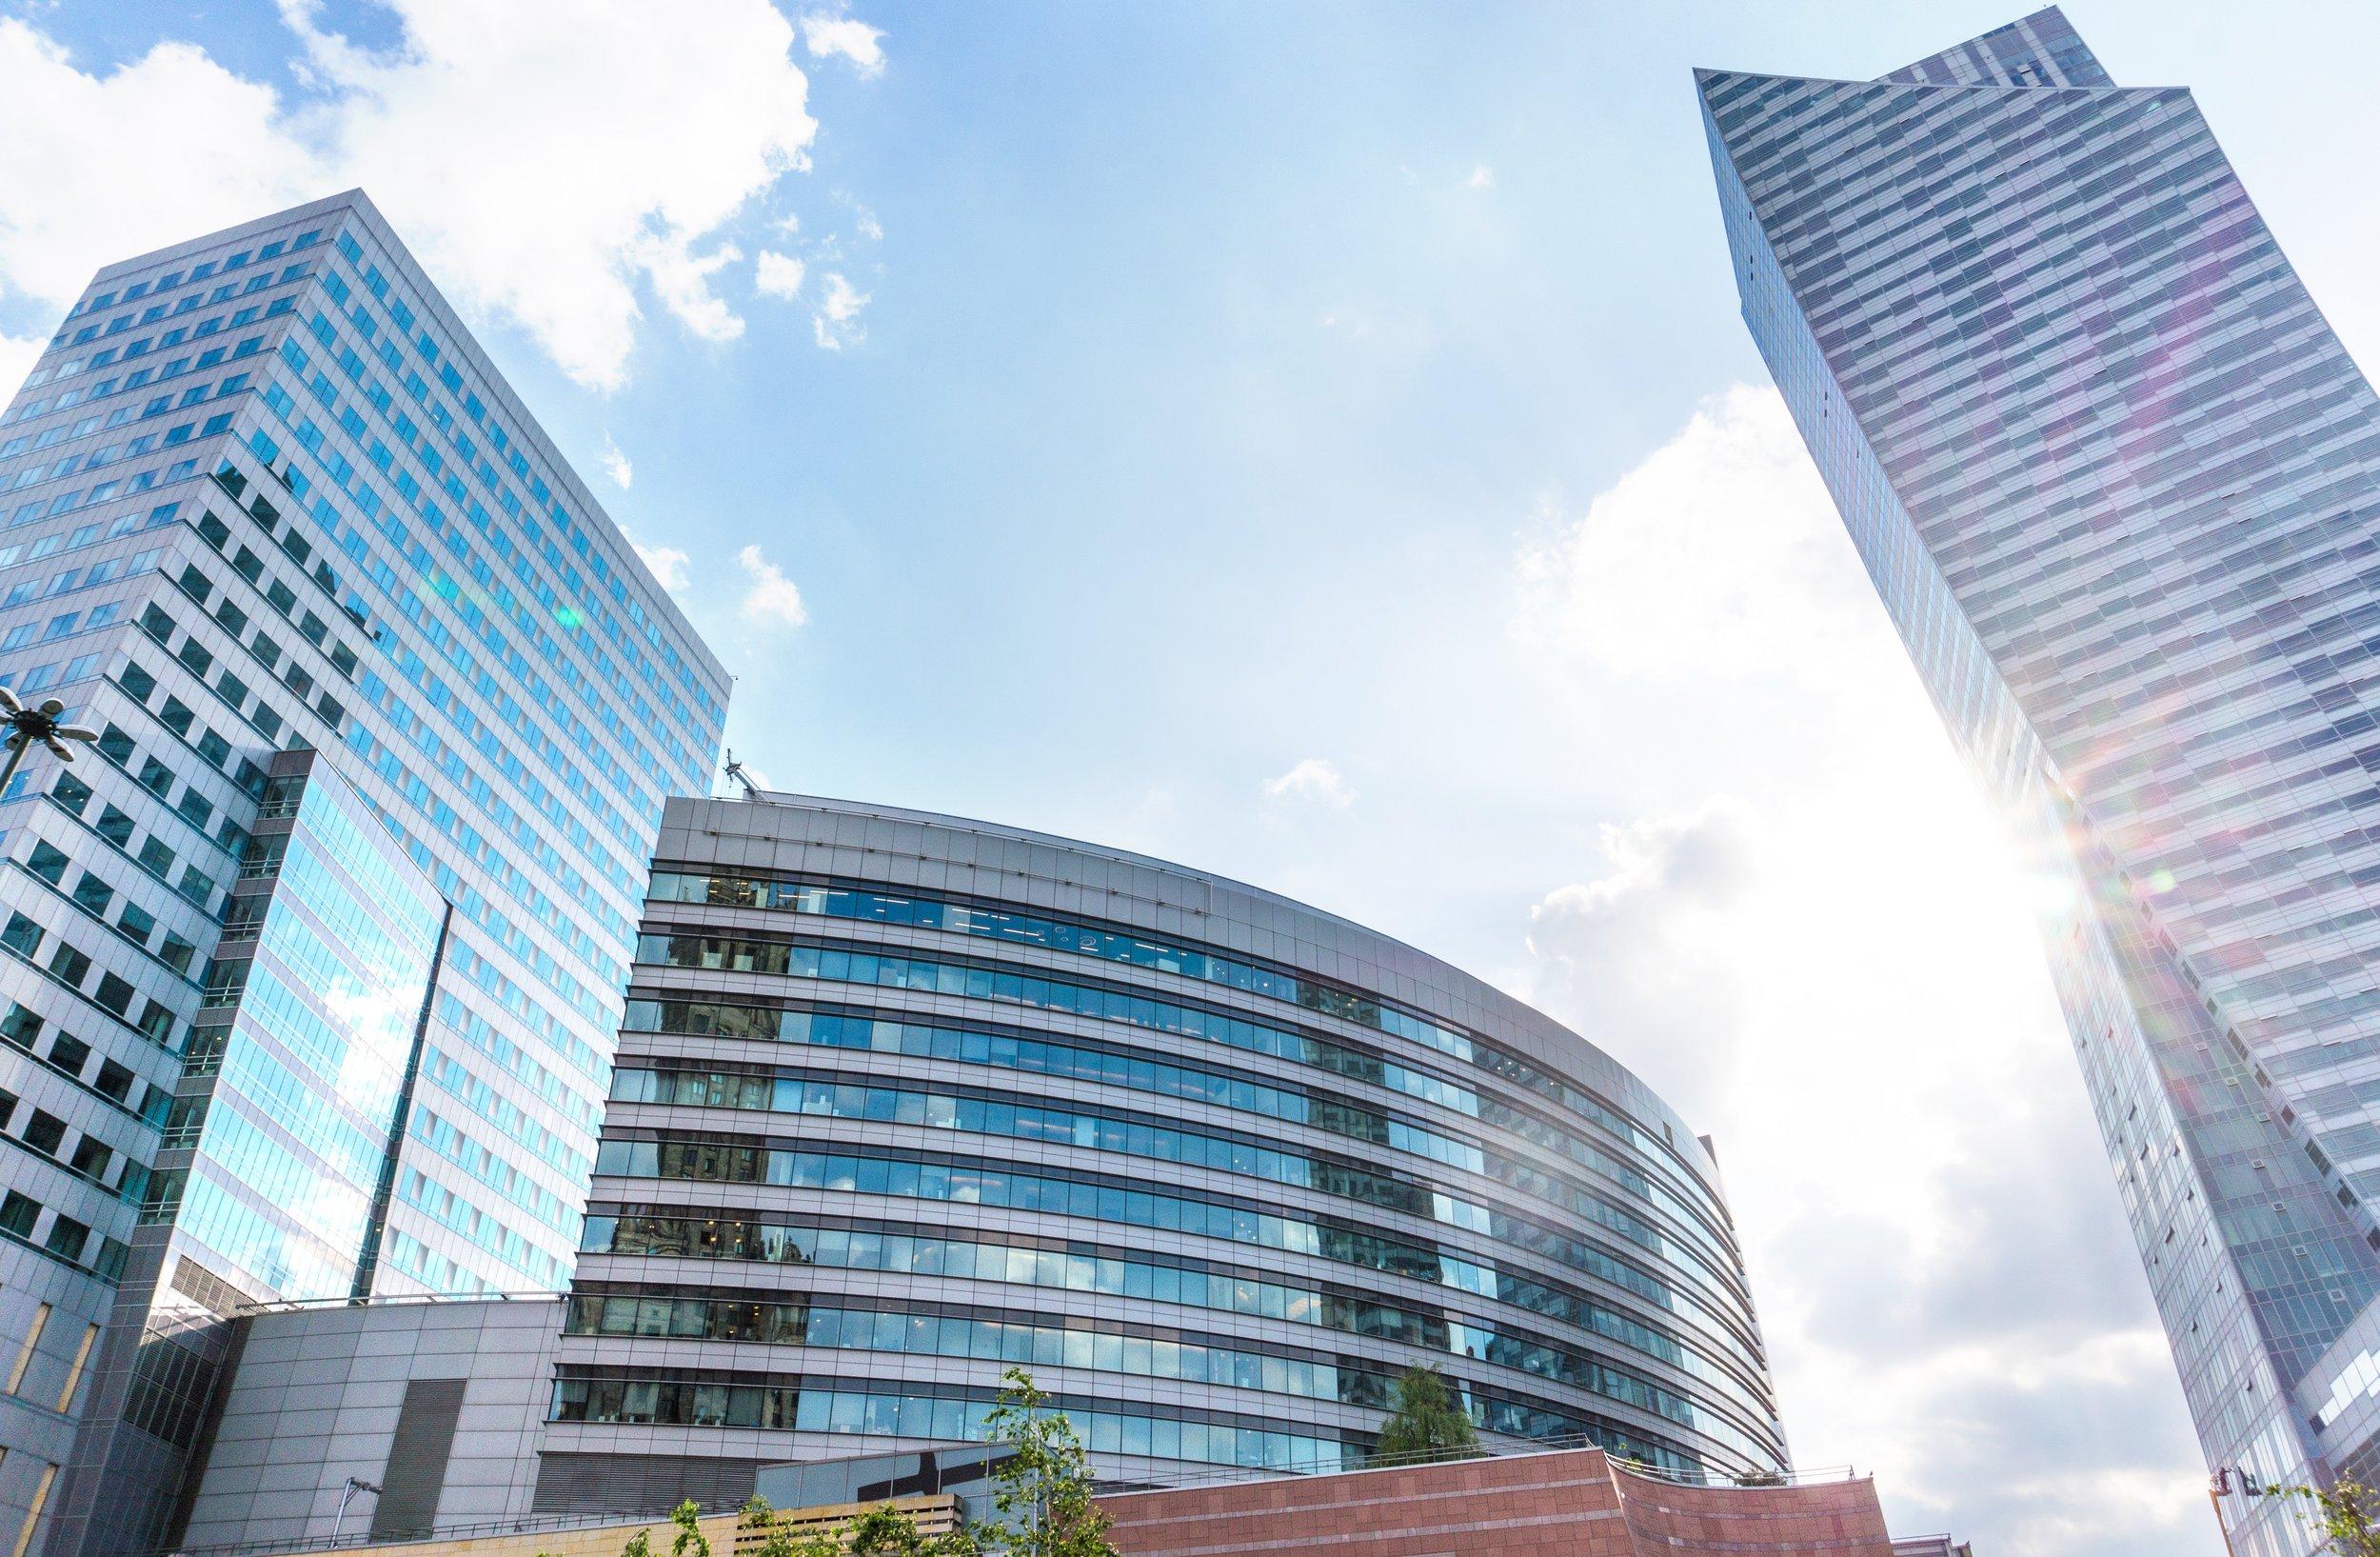 architectural-design-architecture-bangkok-534219.jpg